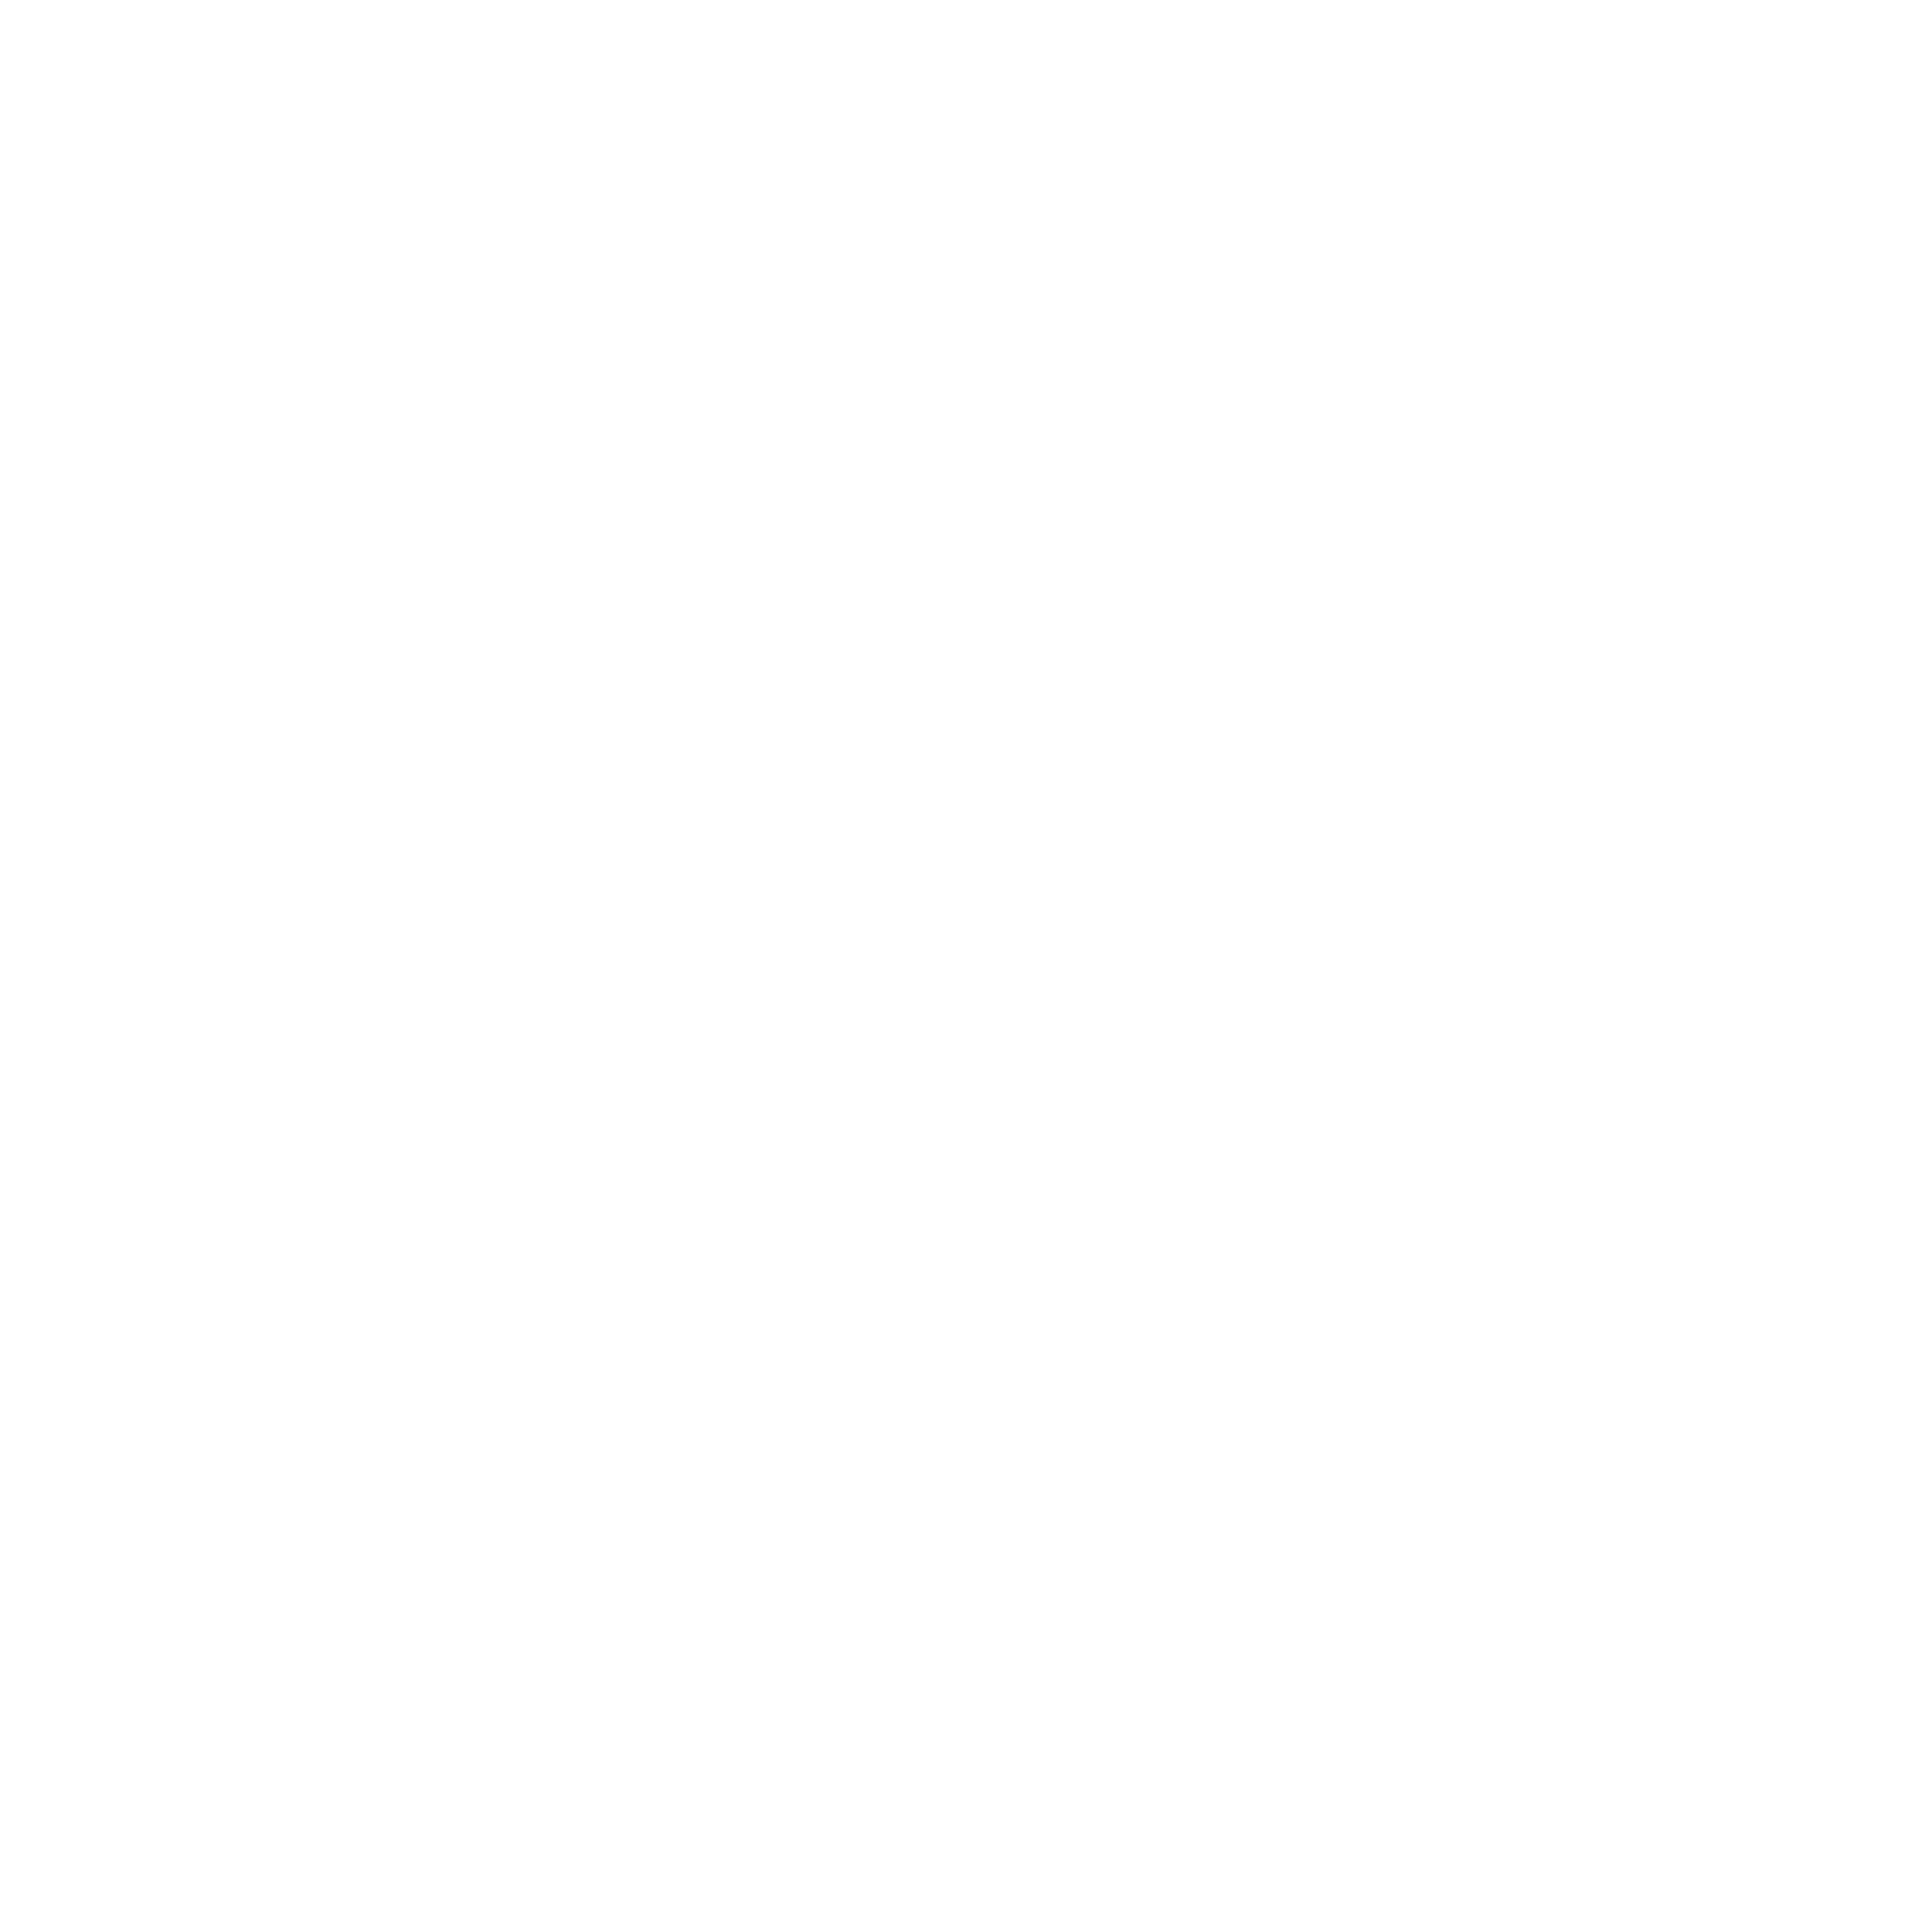 Deloitte Logo PNG Transparent & SVG Vector - Freebie Supply